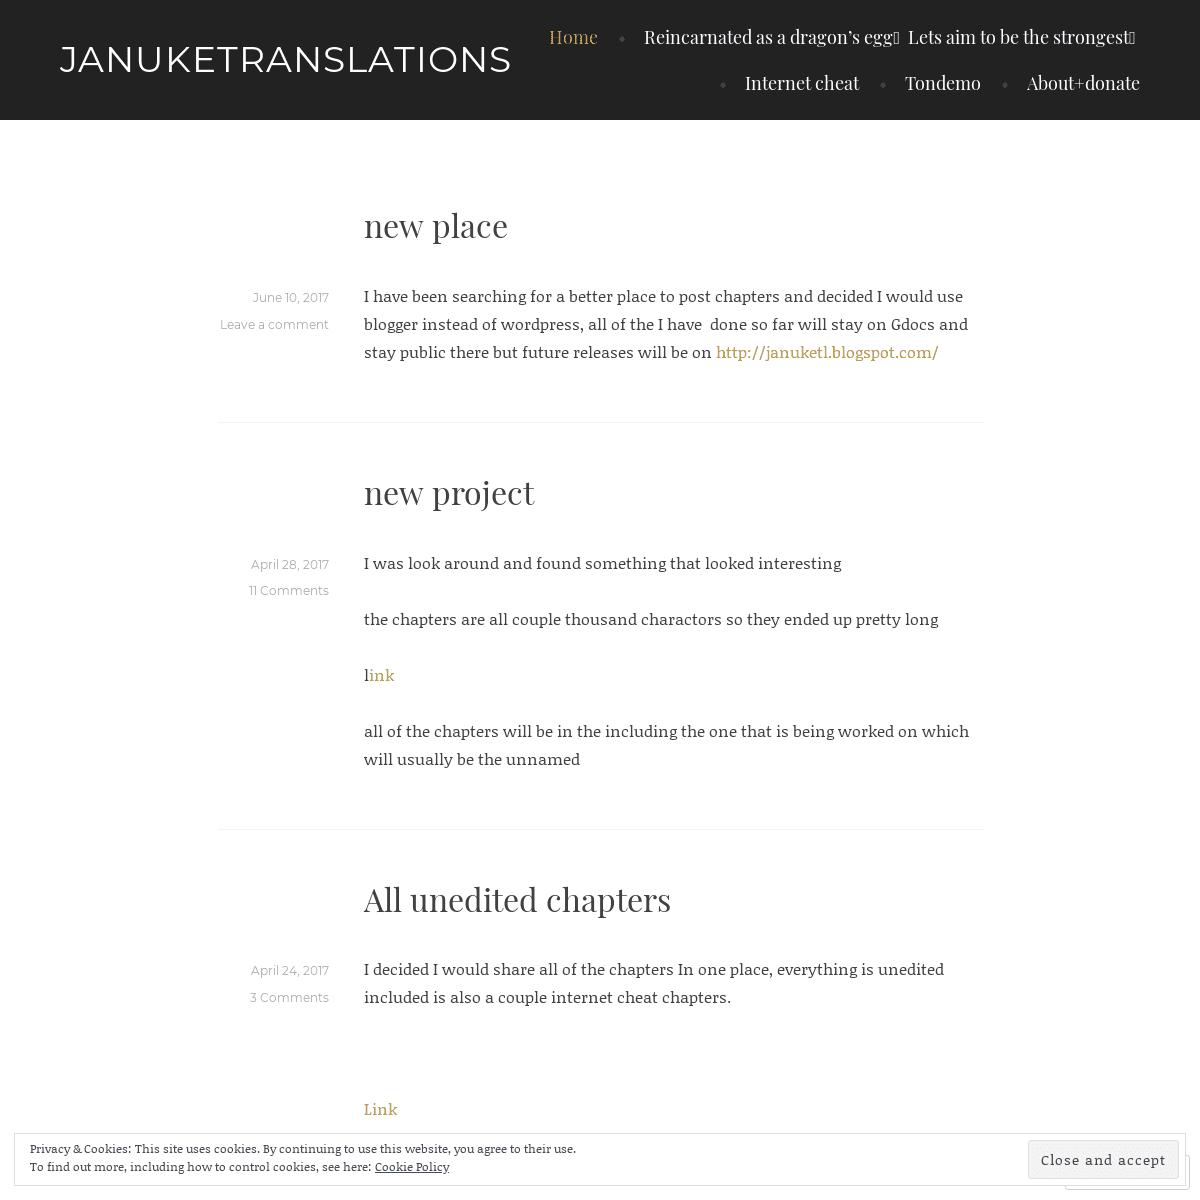 Januketranslations